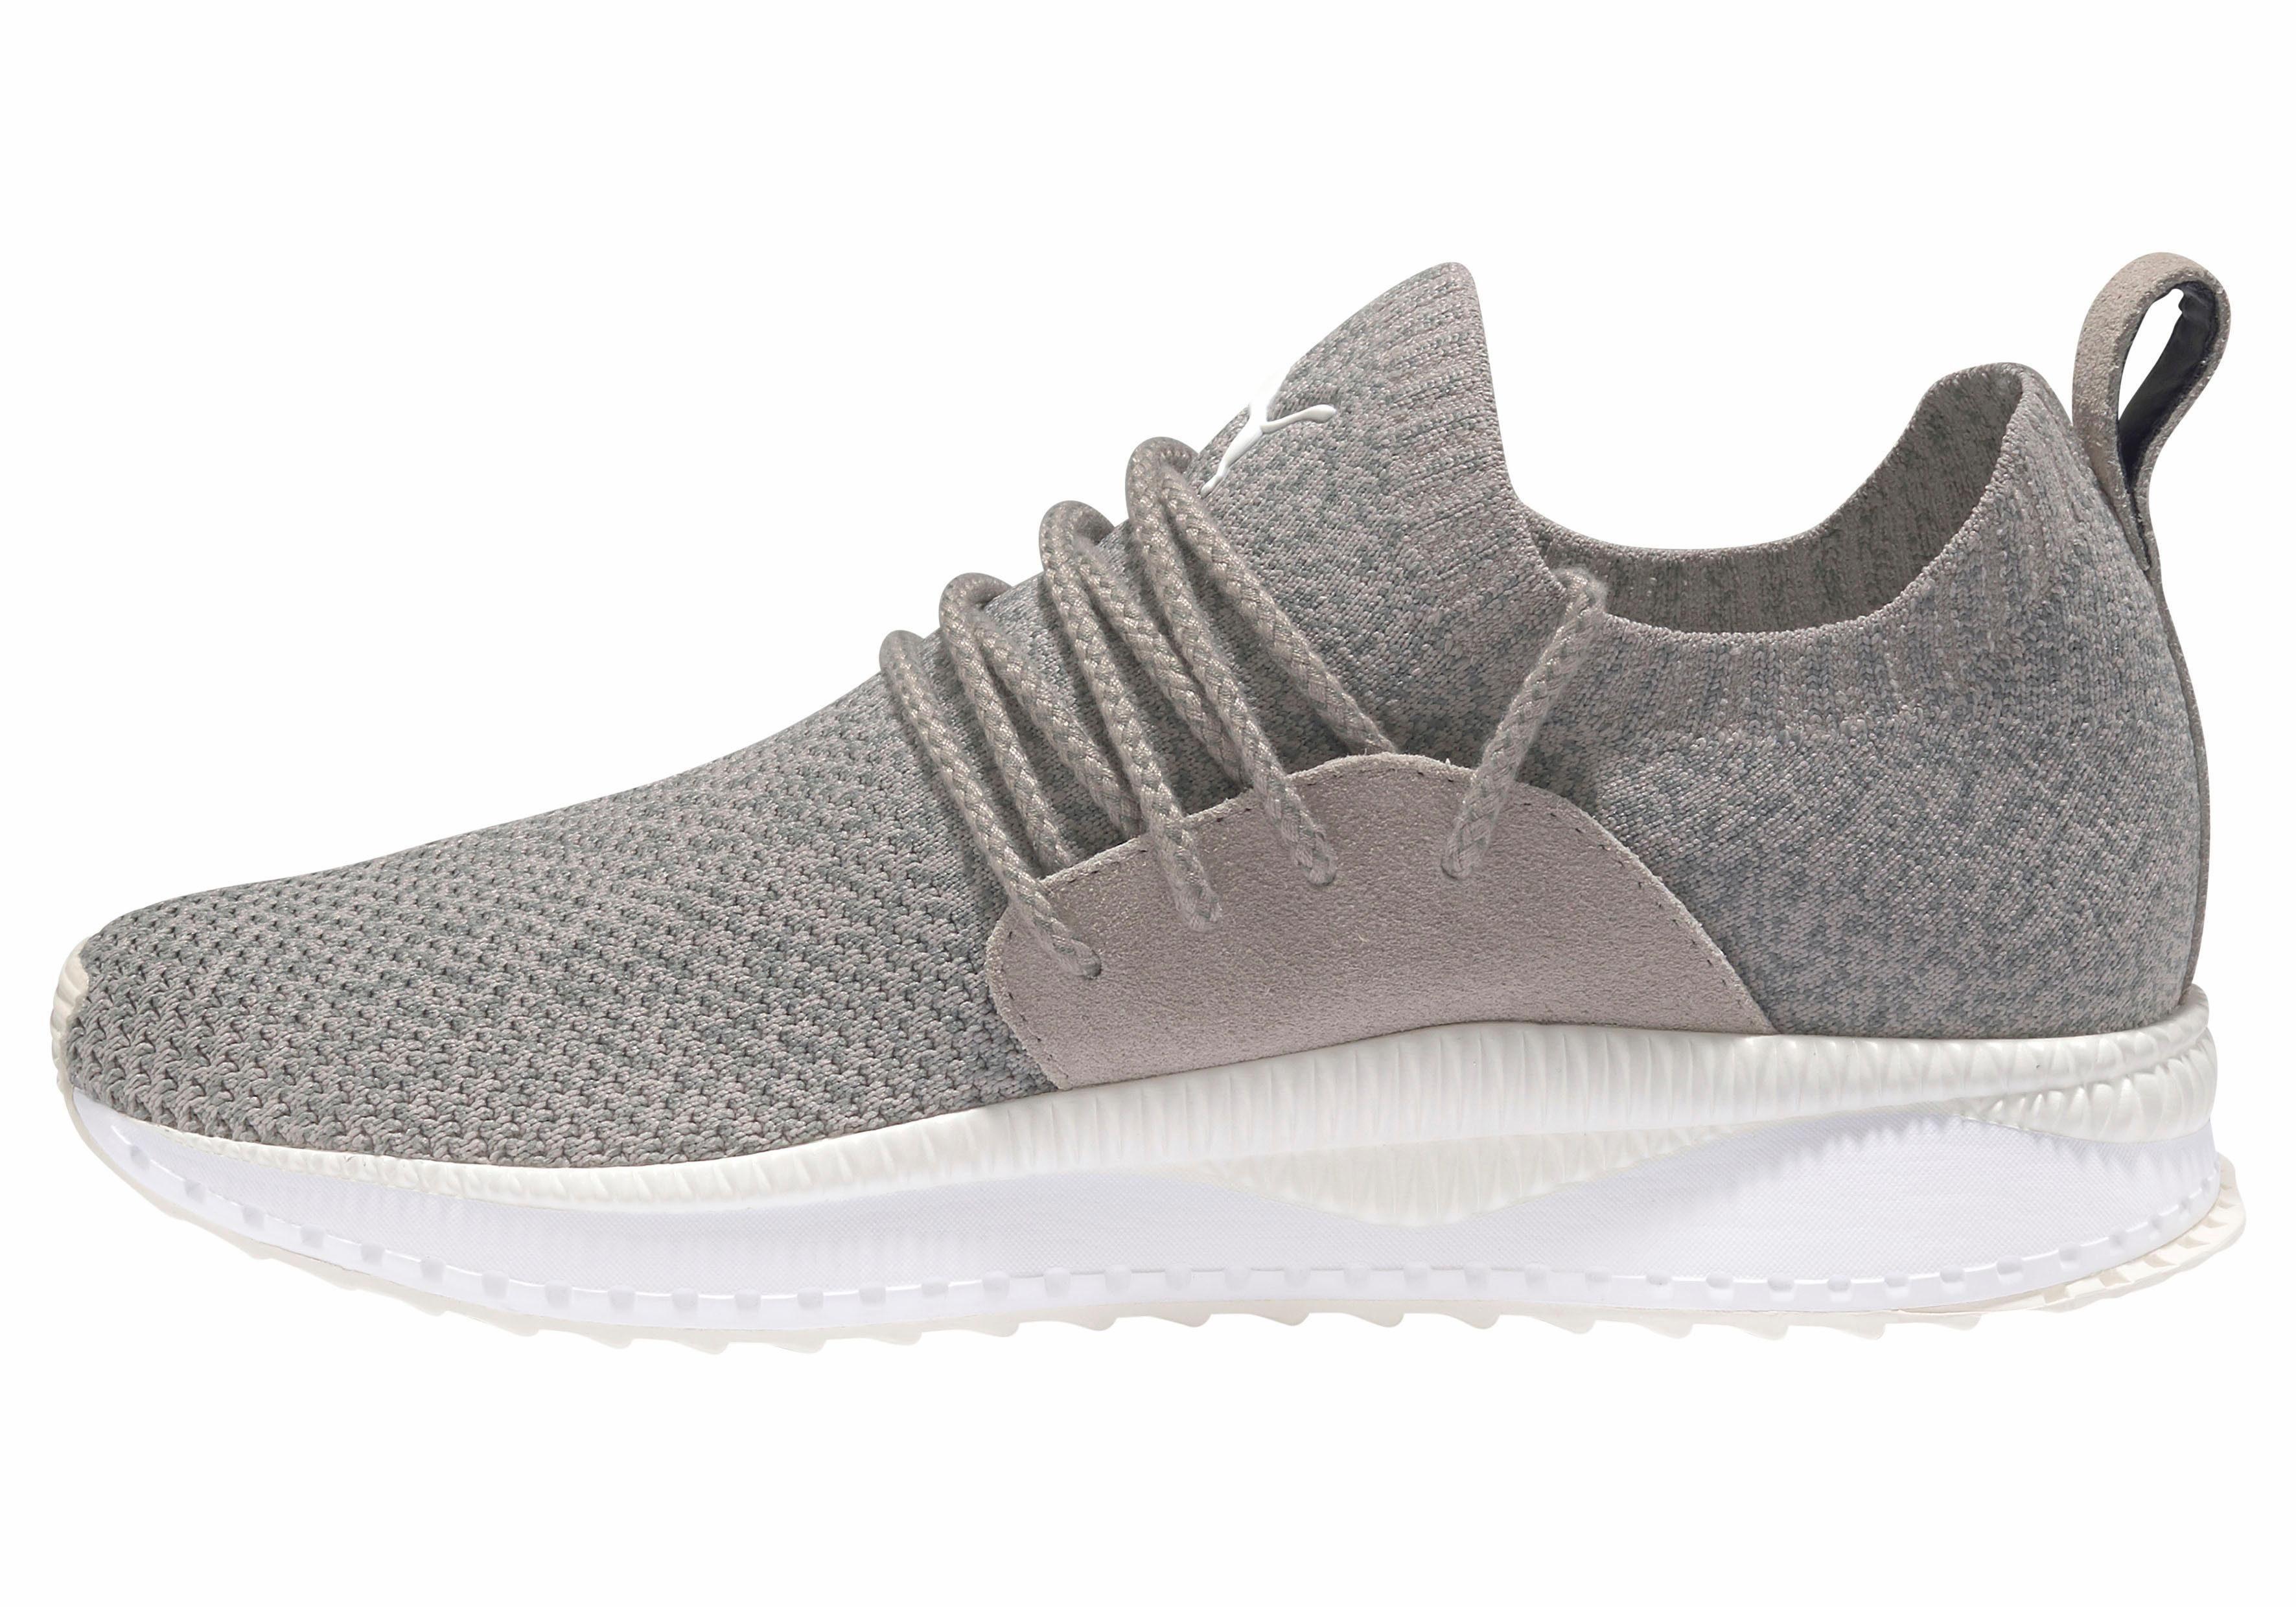 Puma Sneakers Couche Noire 'tsugi M Apex' QDbDdWodqb